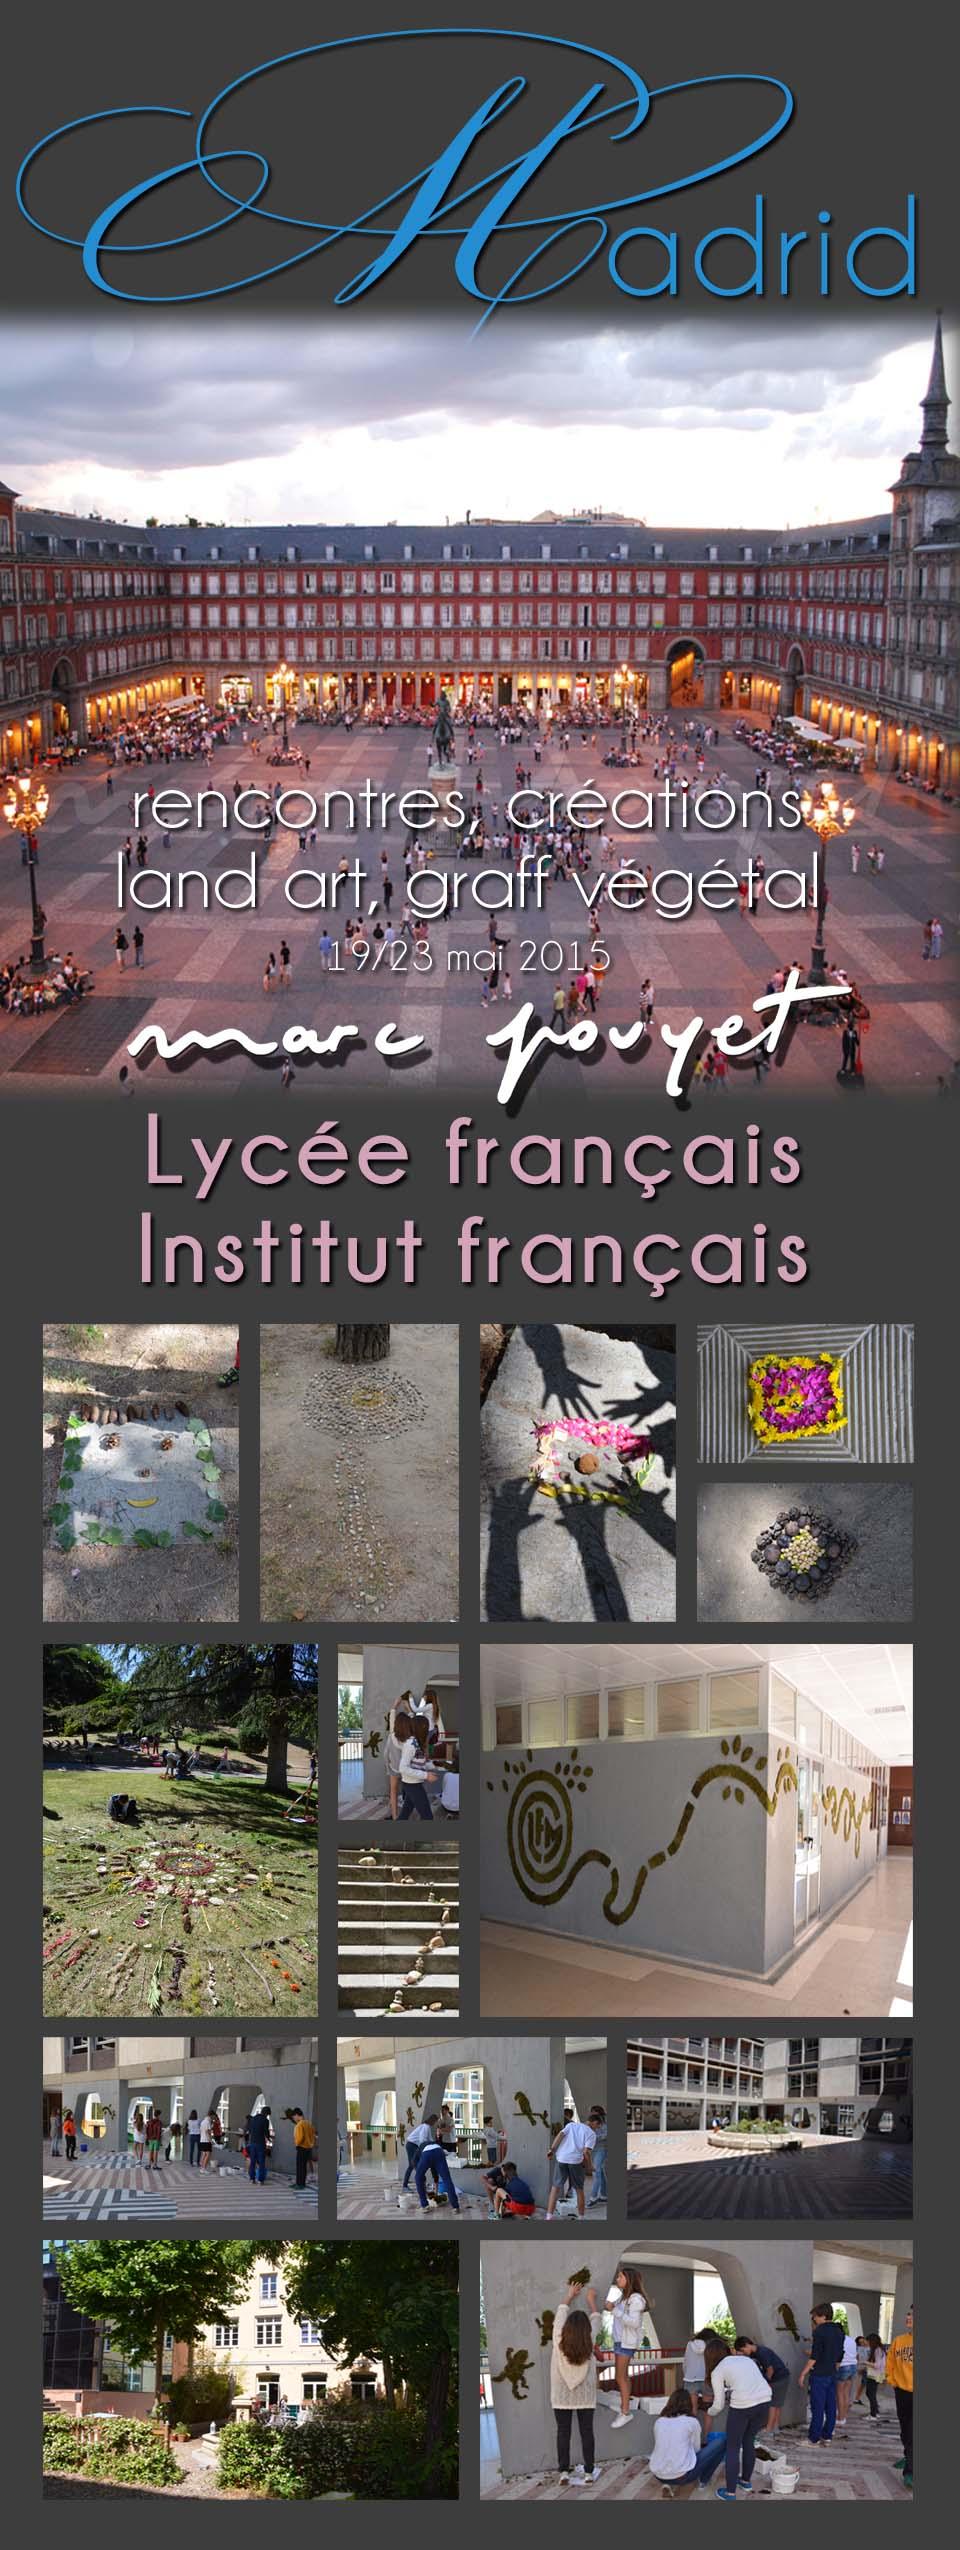 LYCEE FRANCAIS INSTITUT